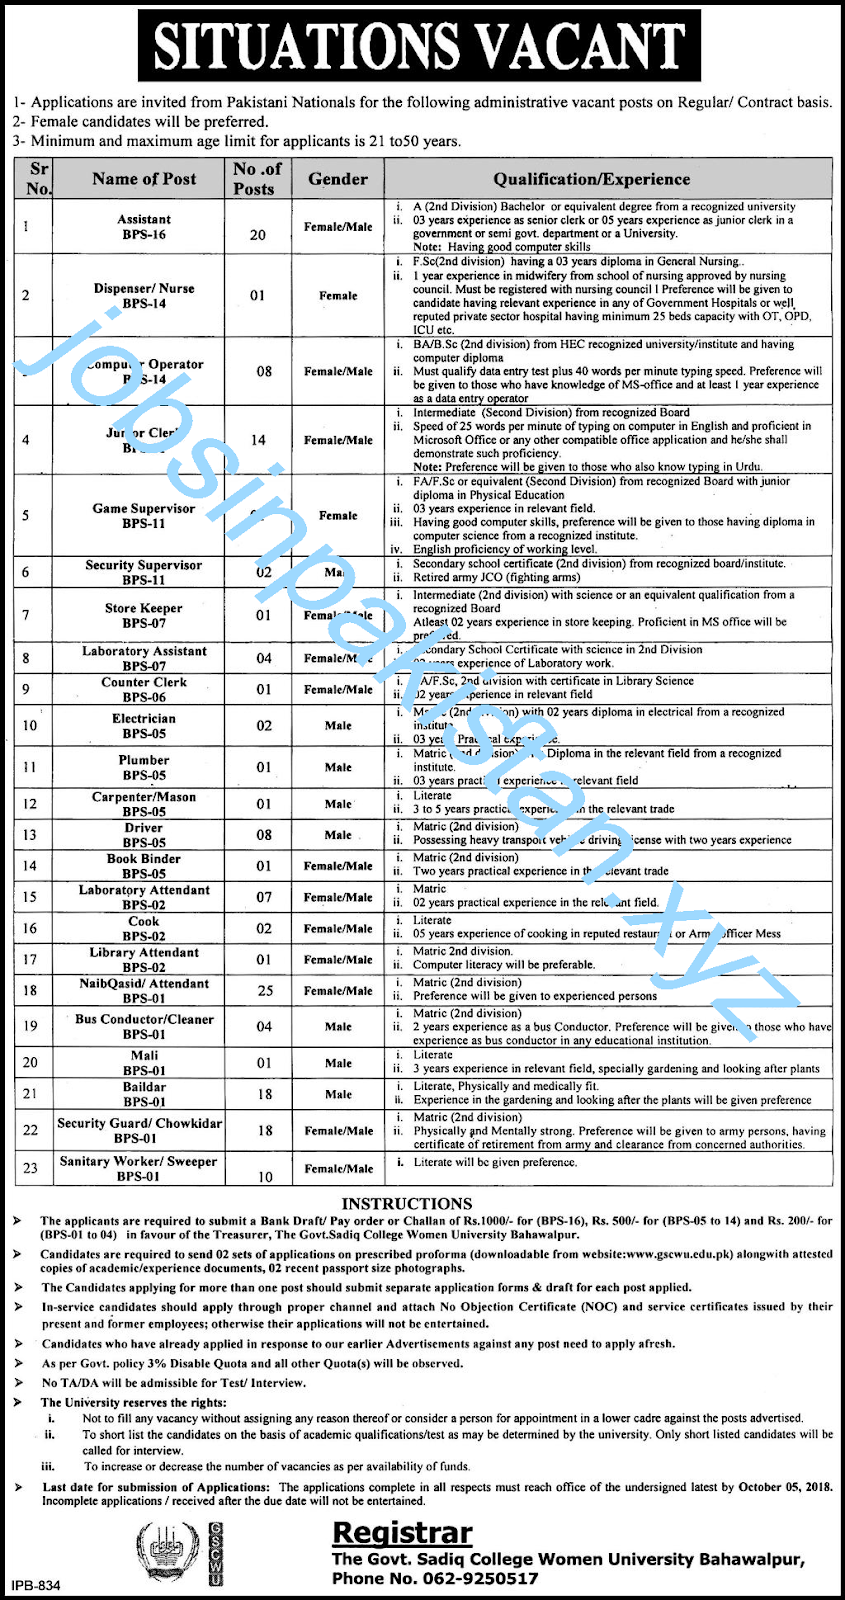 Advertisement for Govt Sadiq College Women University Bahawalpur Jobs 2018